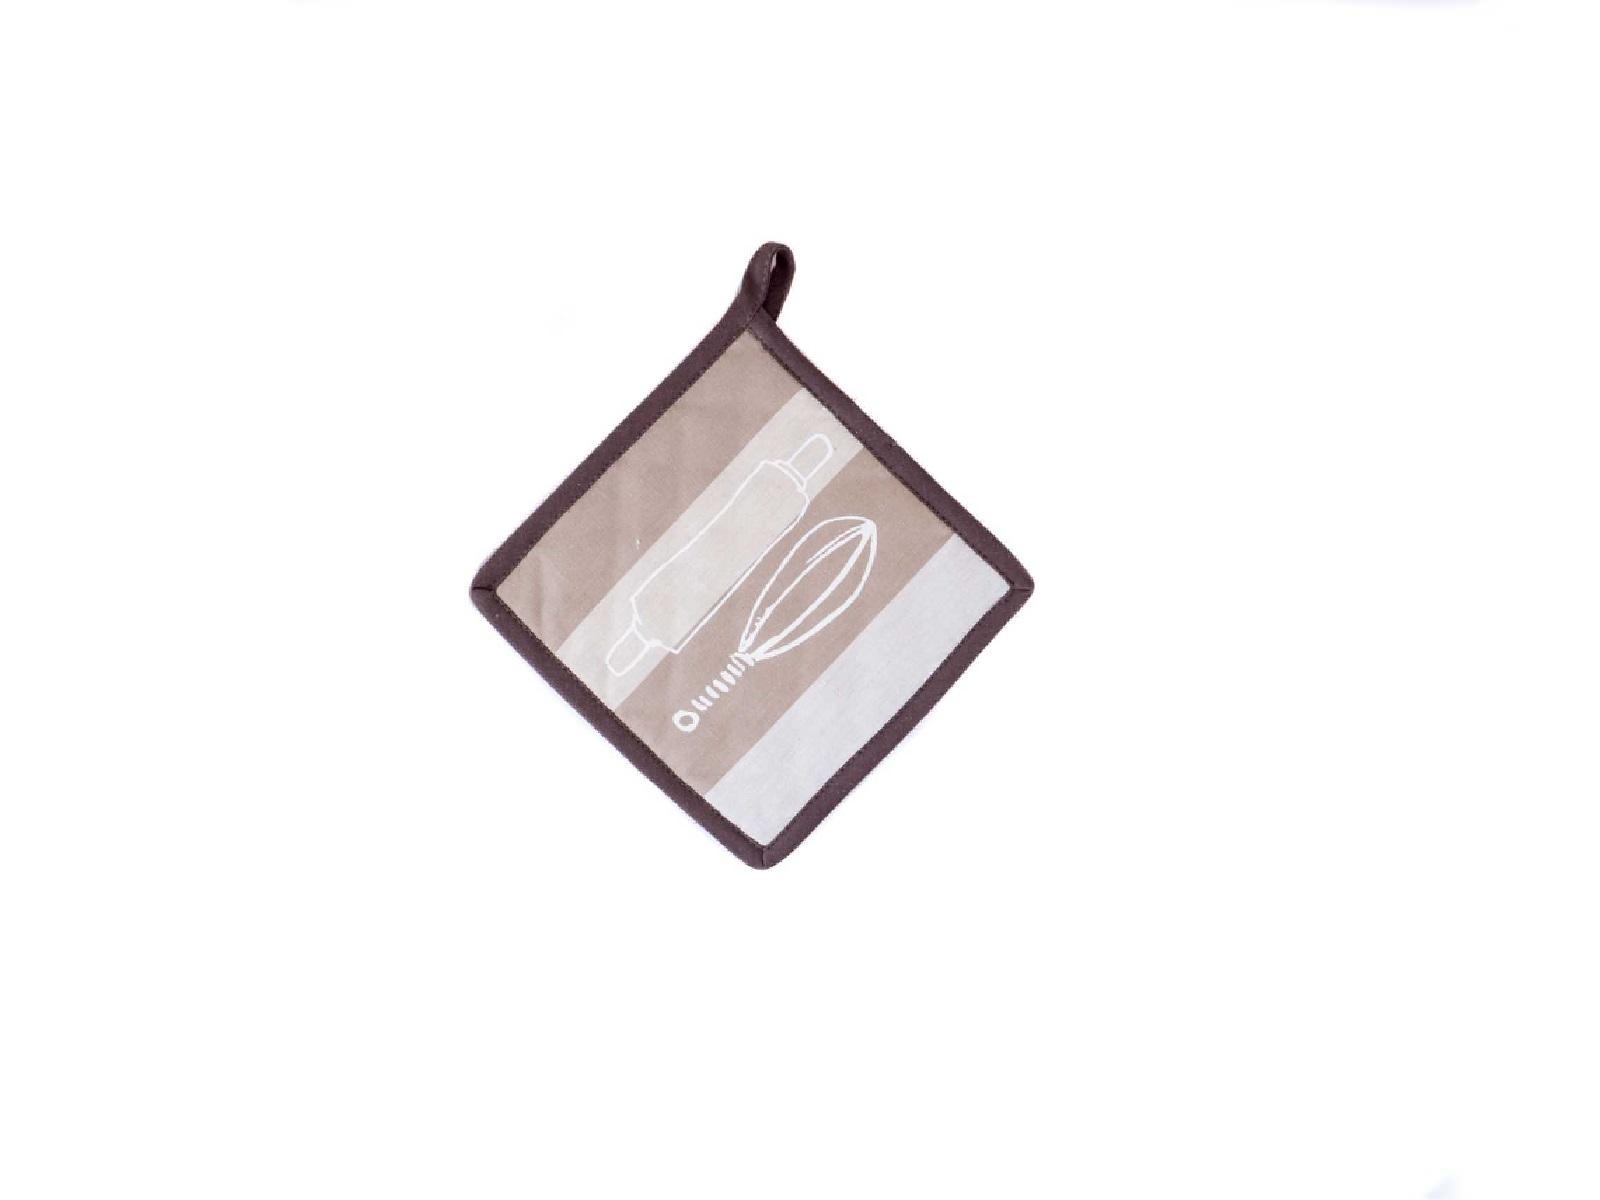 Прихватка кухонная Winkler FANTASY NATURAL, 20х20 см, бежевый в полоску Winkler 4626780000 фото 1